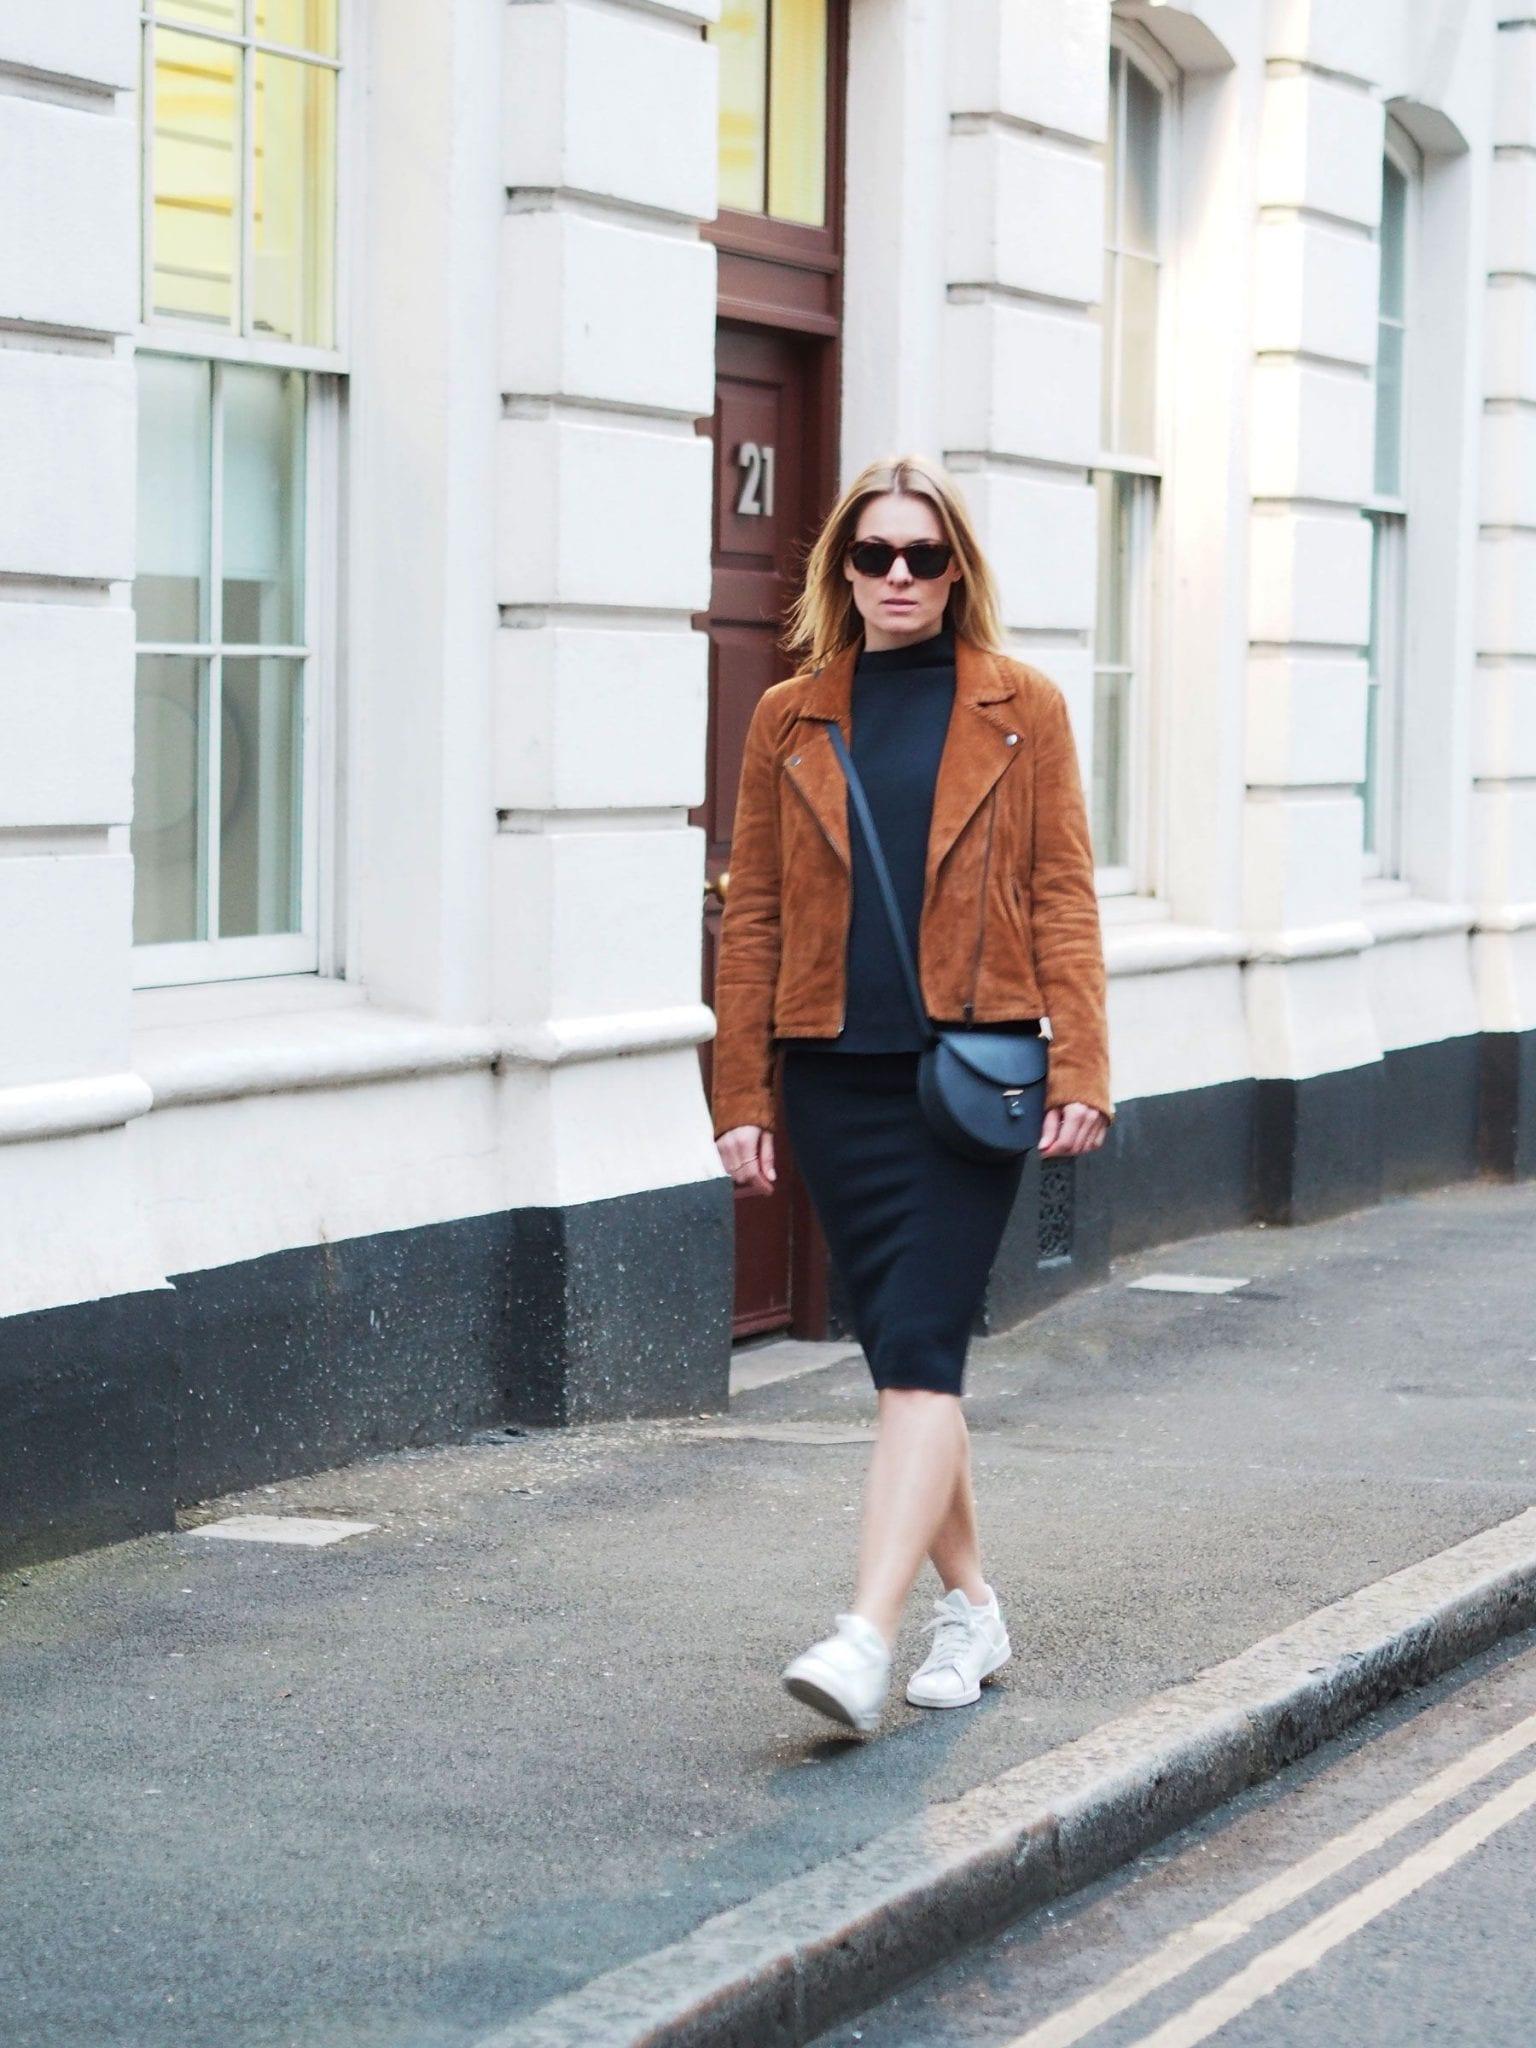 Style&Minimalism | It's Personal | Samsøe & Samsøe Top & Skirt Navy Coord, Second Female Tan Suede Jacket, Triwa Sunglasses